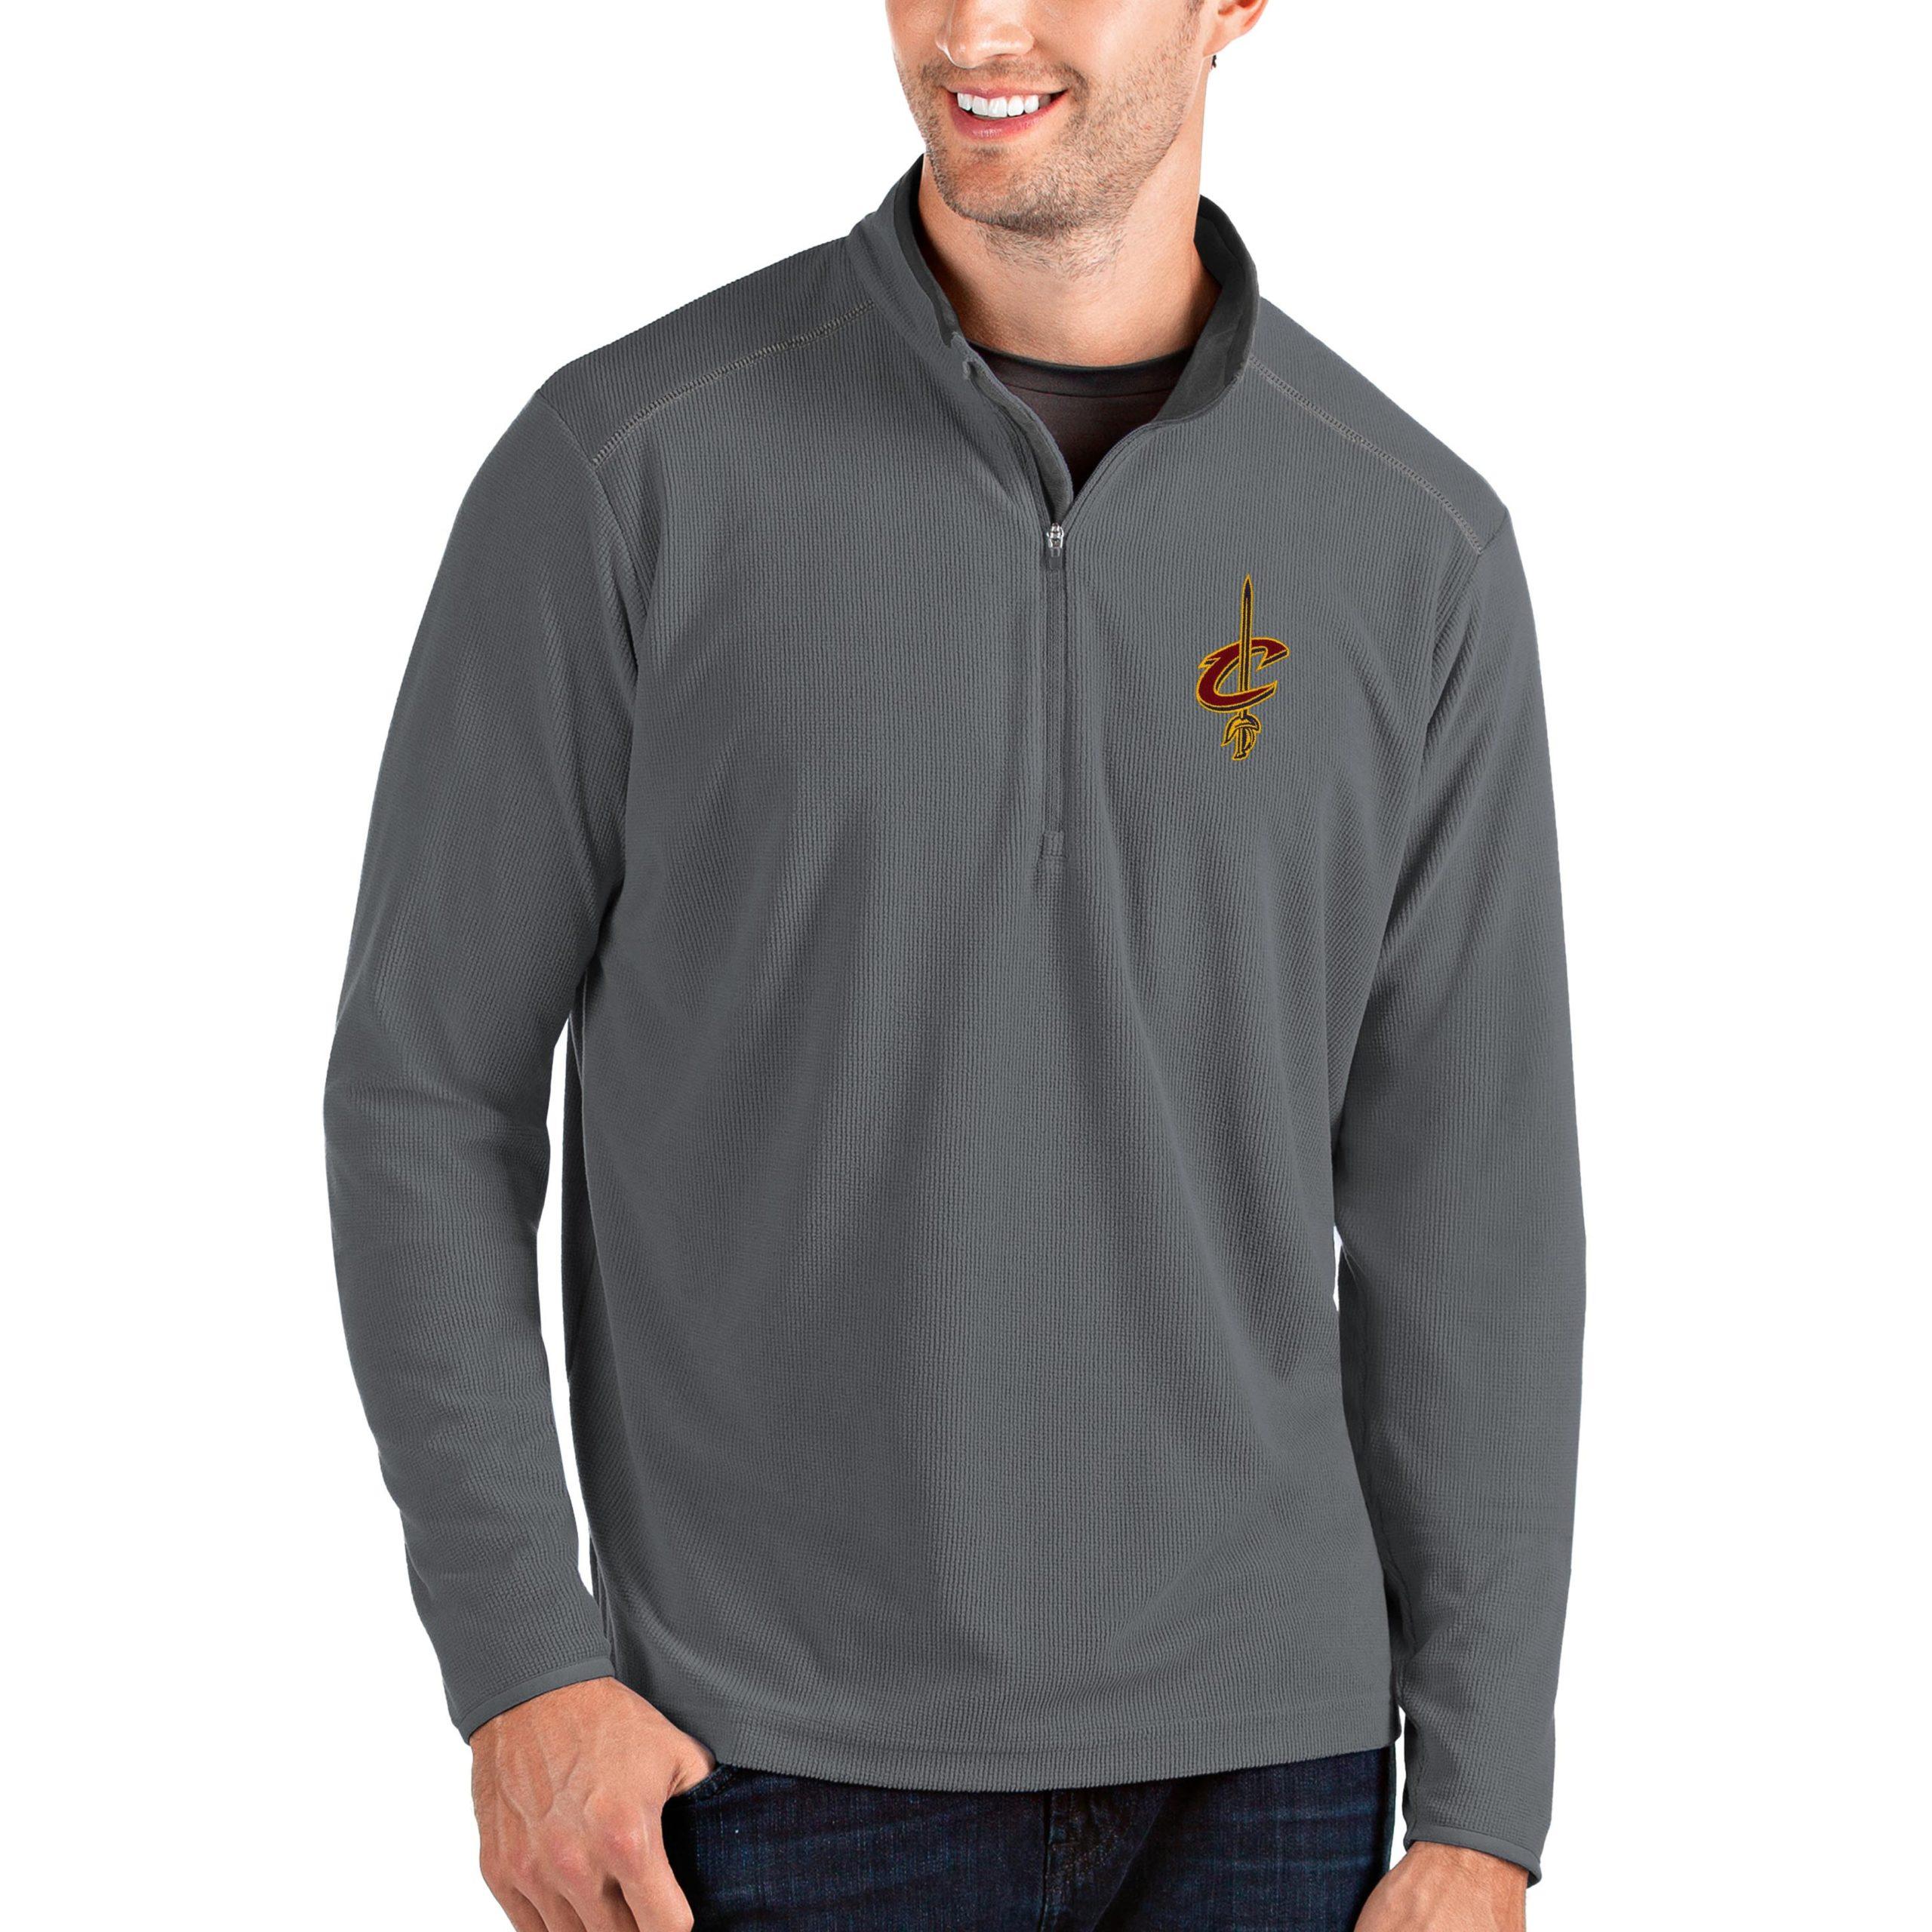 Cleveland Cavaliers Antigua Big & Tall Glacier Quarter-Zip Pullover Jacket - Gray/Gray